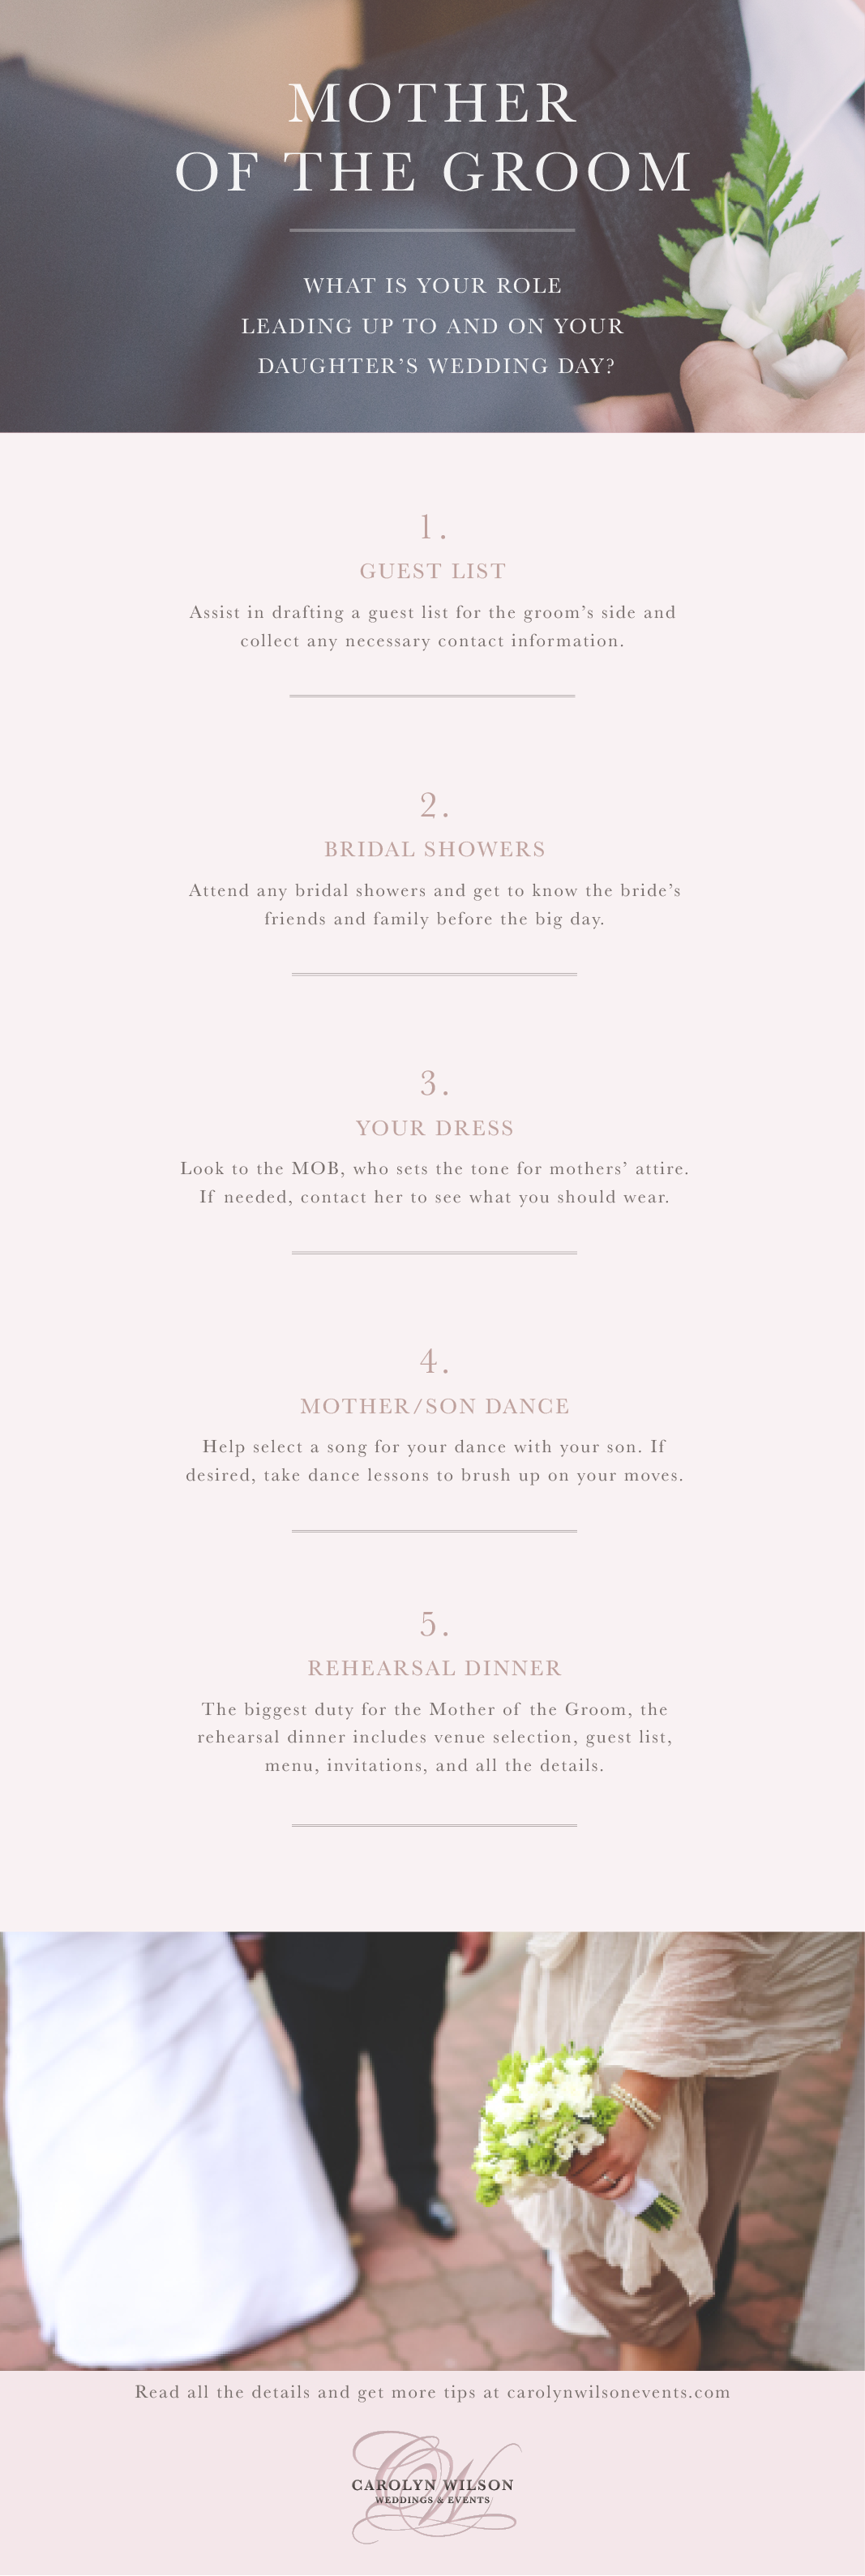 San Francisco Wedding Coordination | Carolyn Wilson